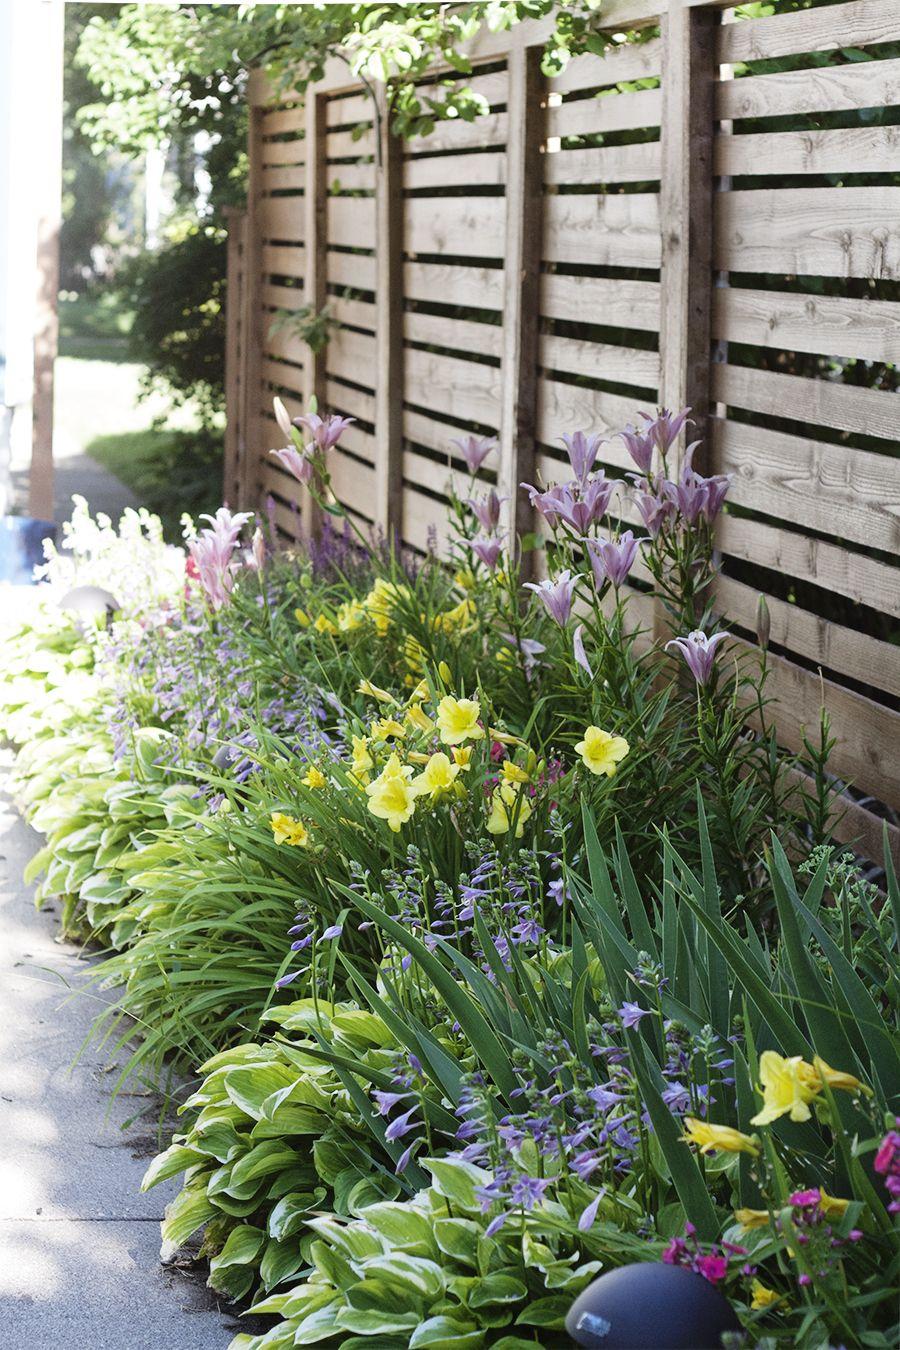 25+ Ideas for Decorating your Garden Fence (DIY) | Flower, Gardens ...